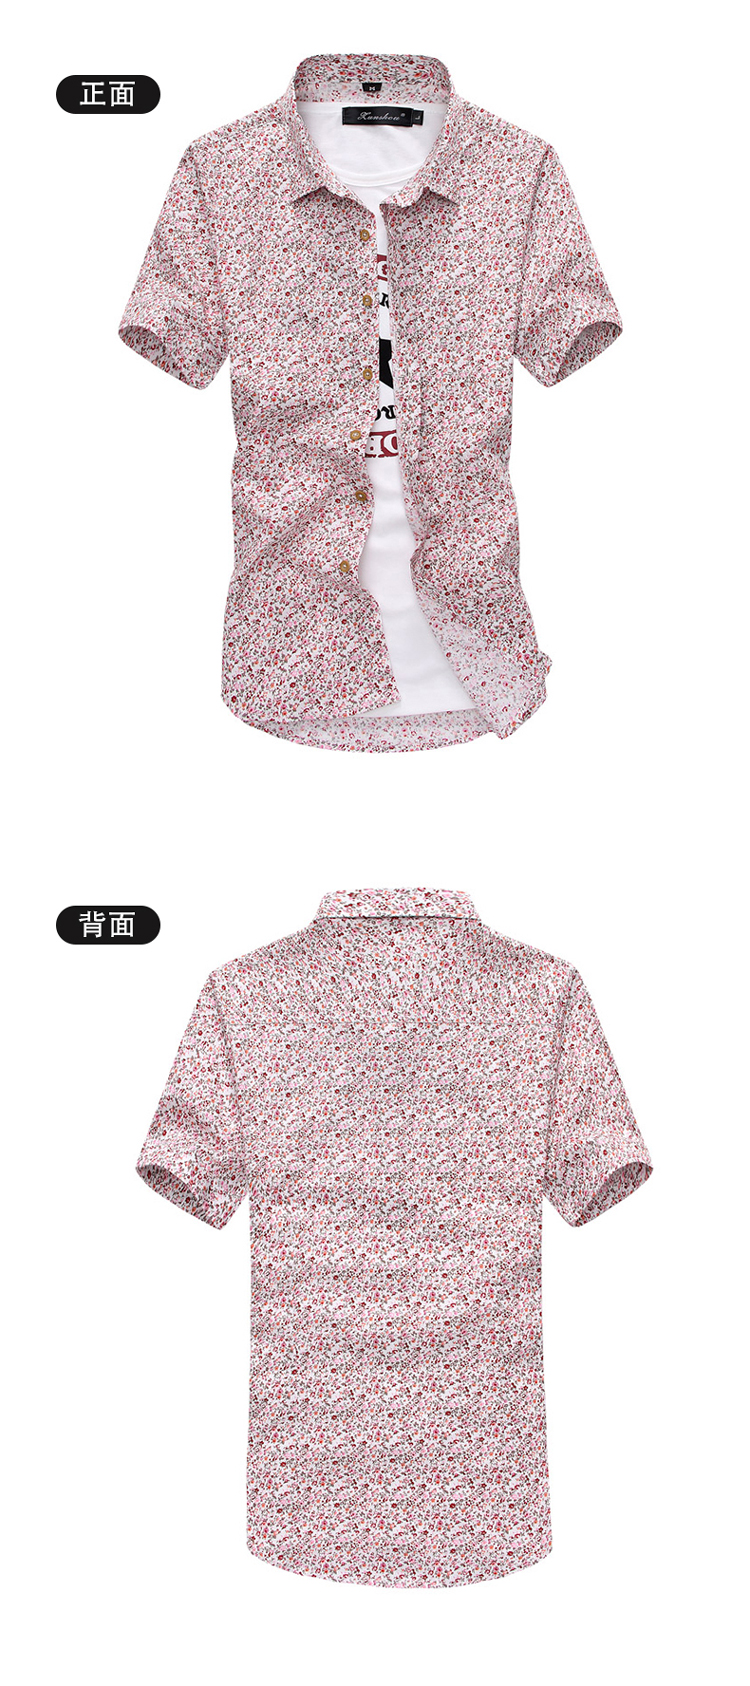 Men Summer Thin Shirts Short Sleeve Floral Shirts New Fashion Men Outwear Casual Slim Shirts Mens Cotton dress shirts 10 Online shopping Bangladesh